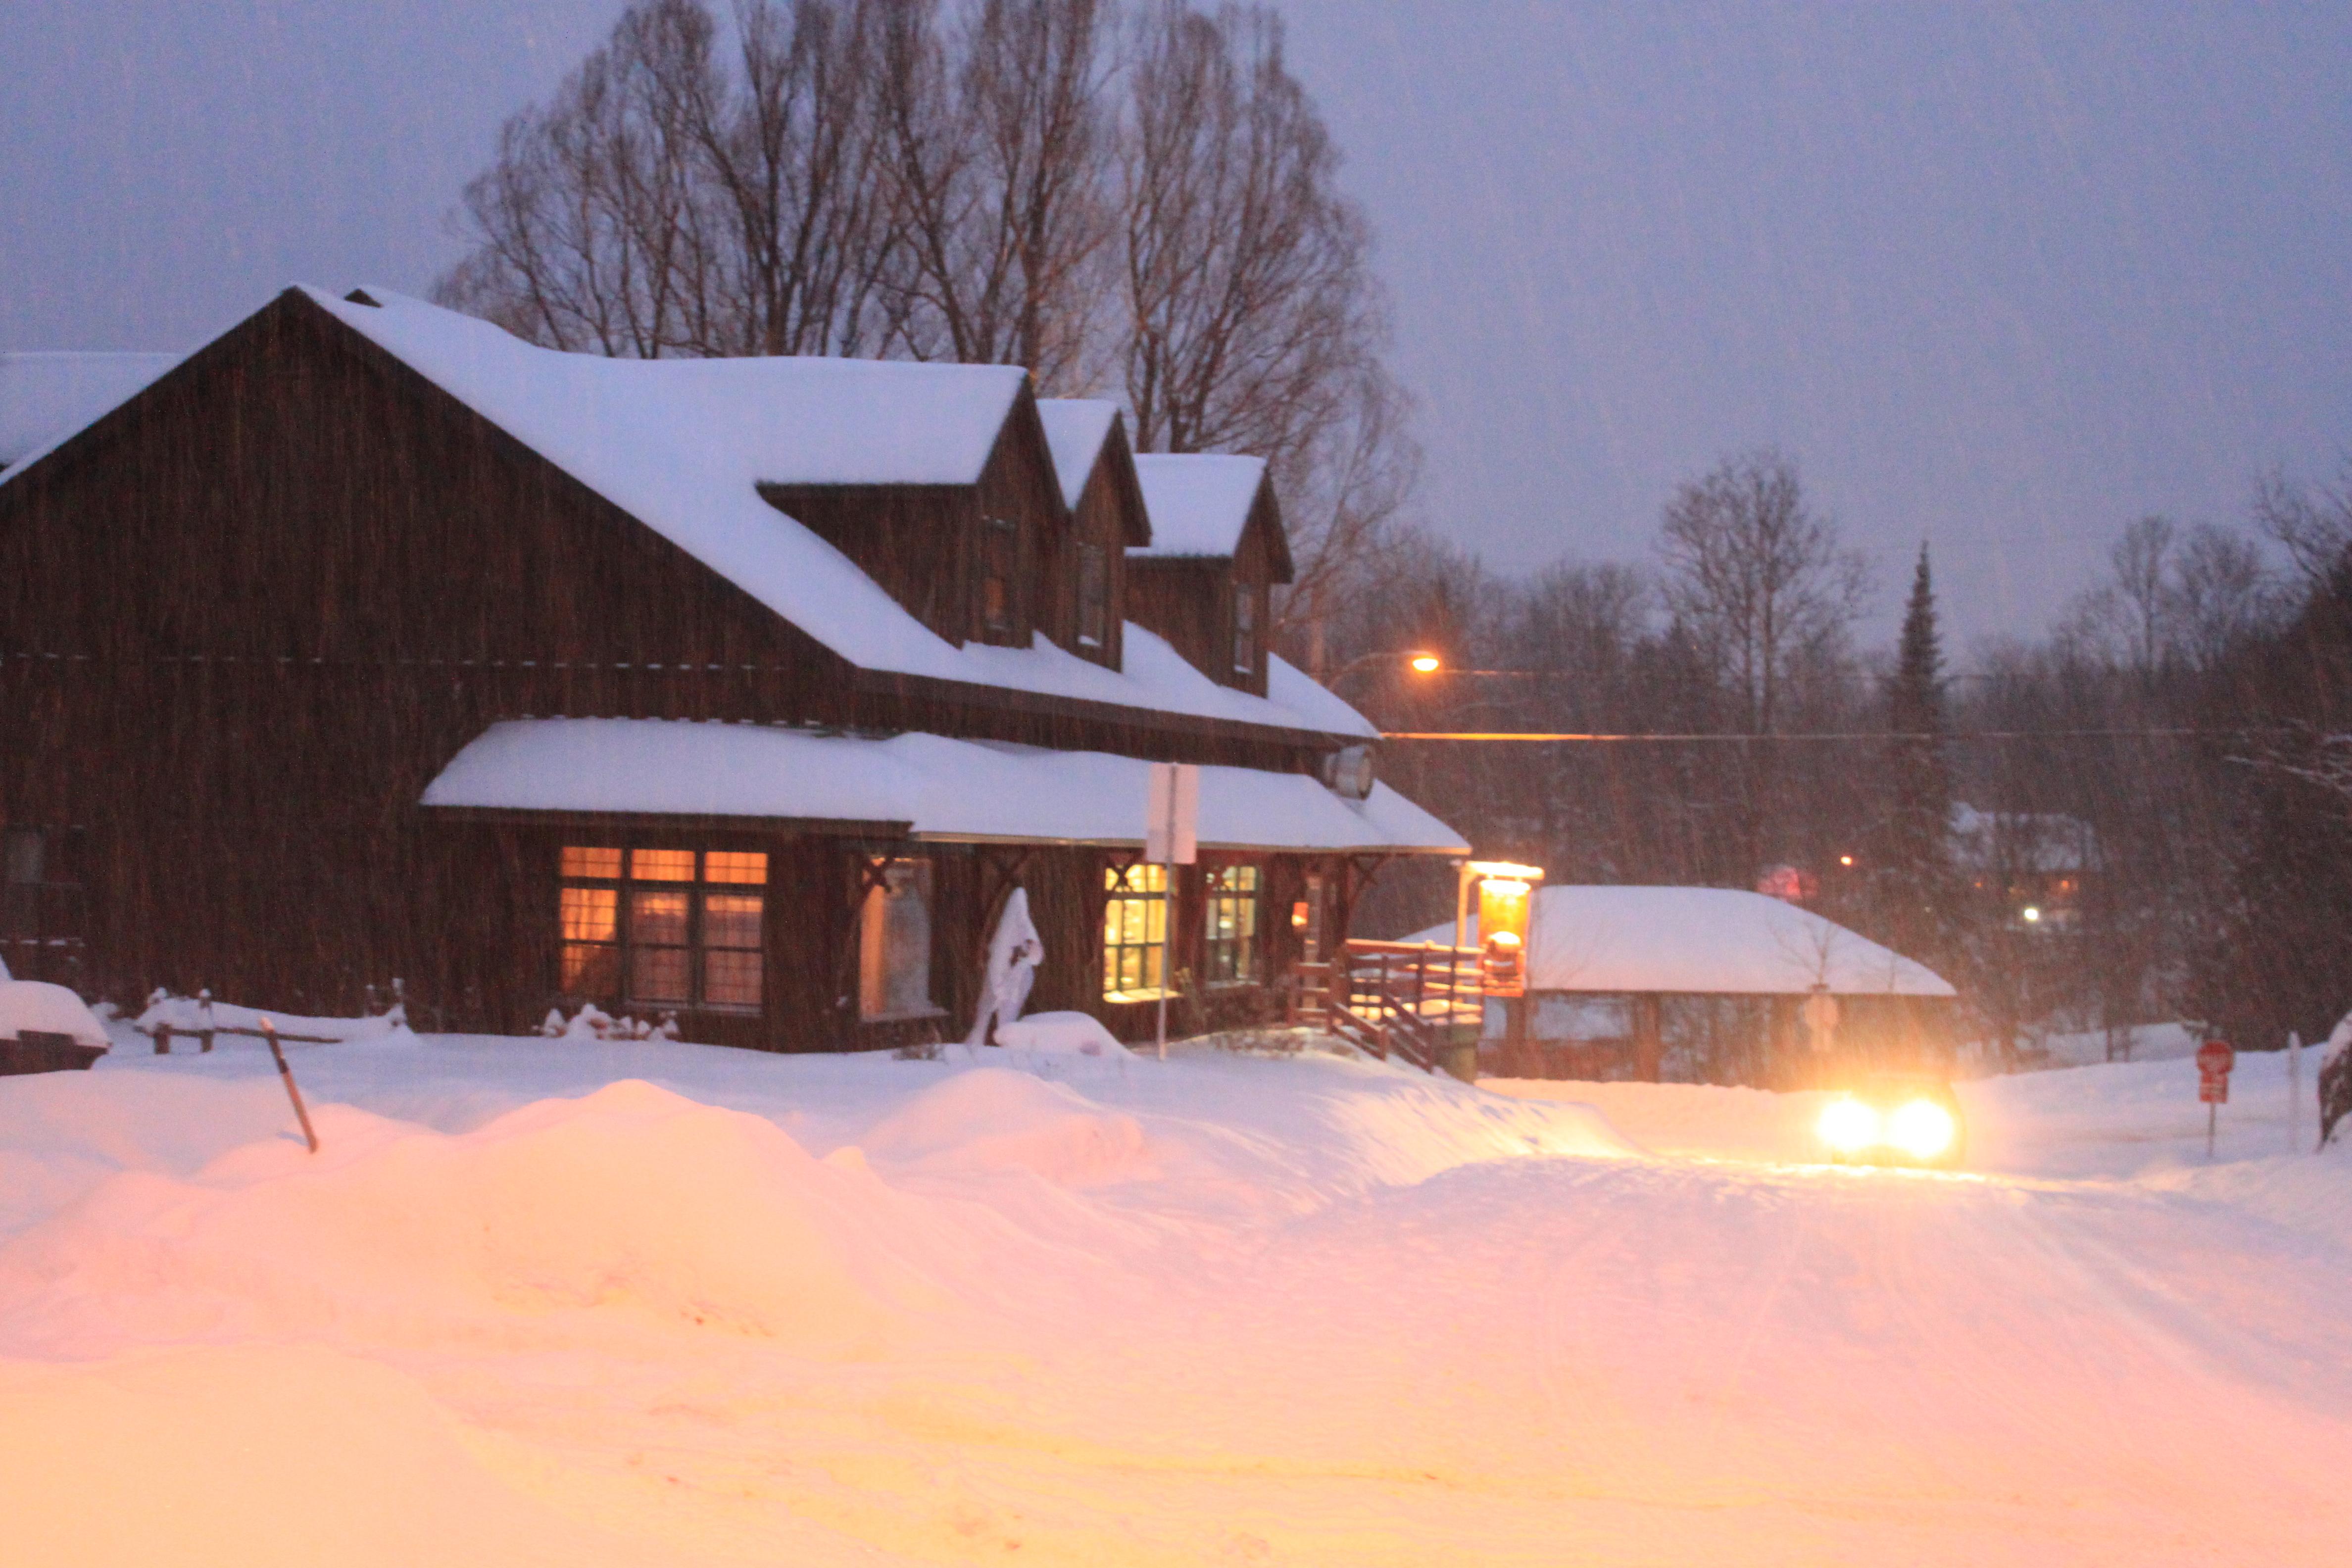 val david auberge hiver ski dortoir petit prix pas cher